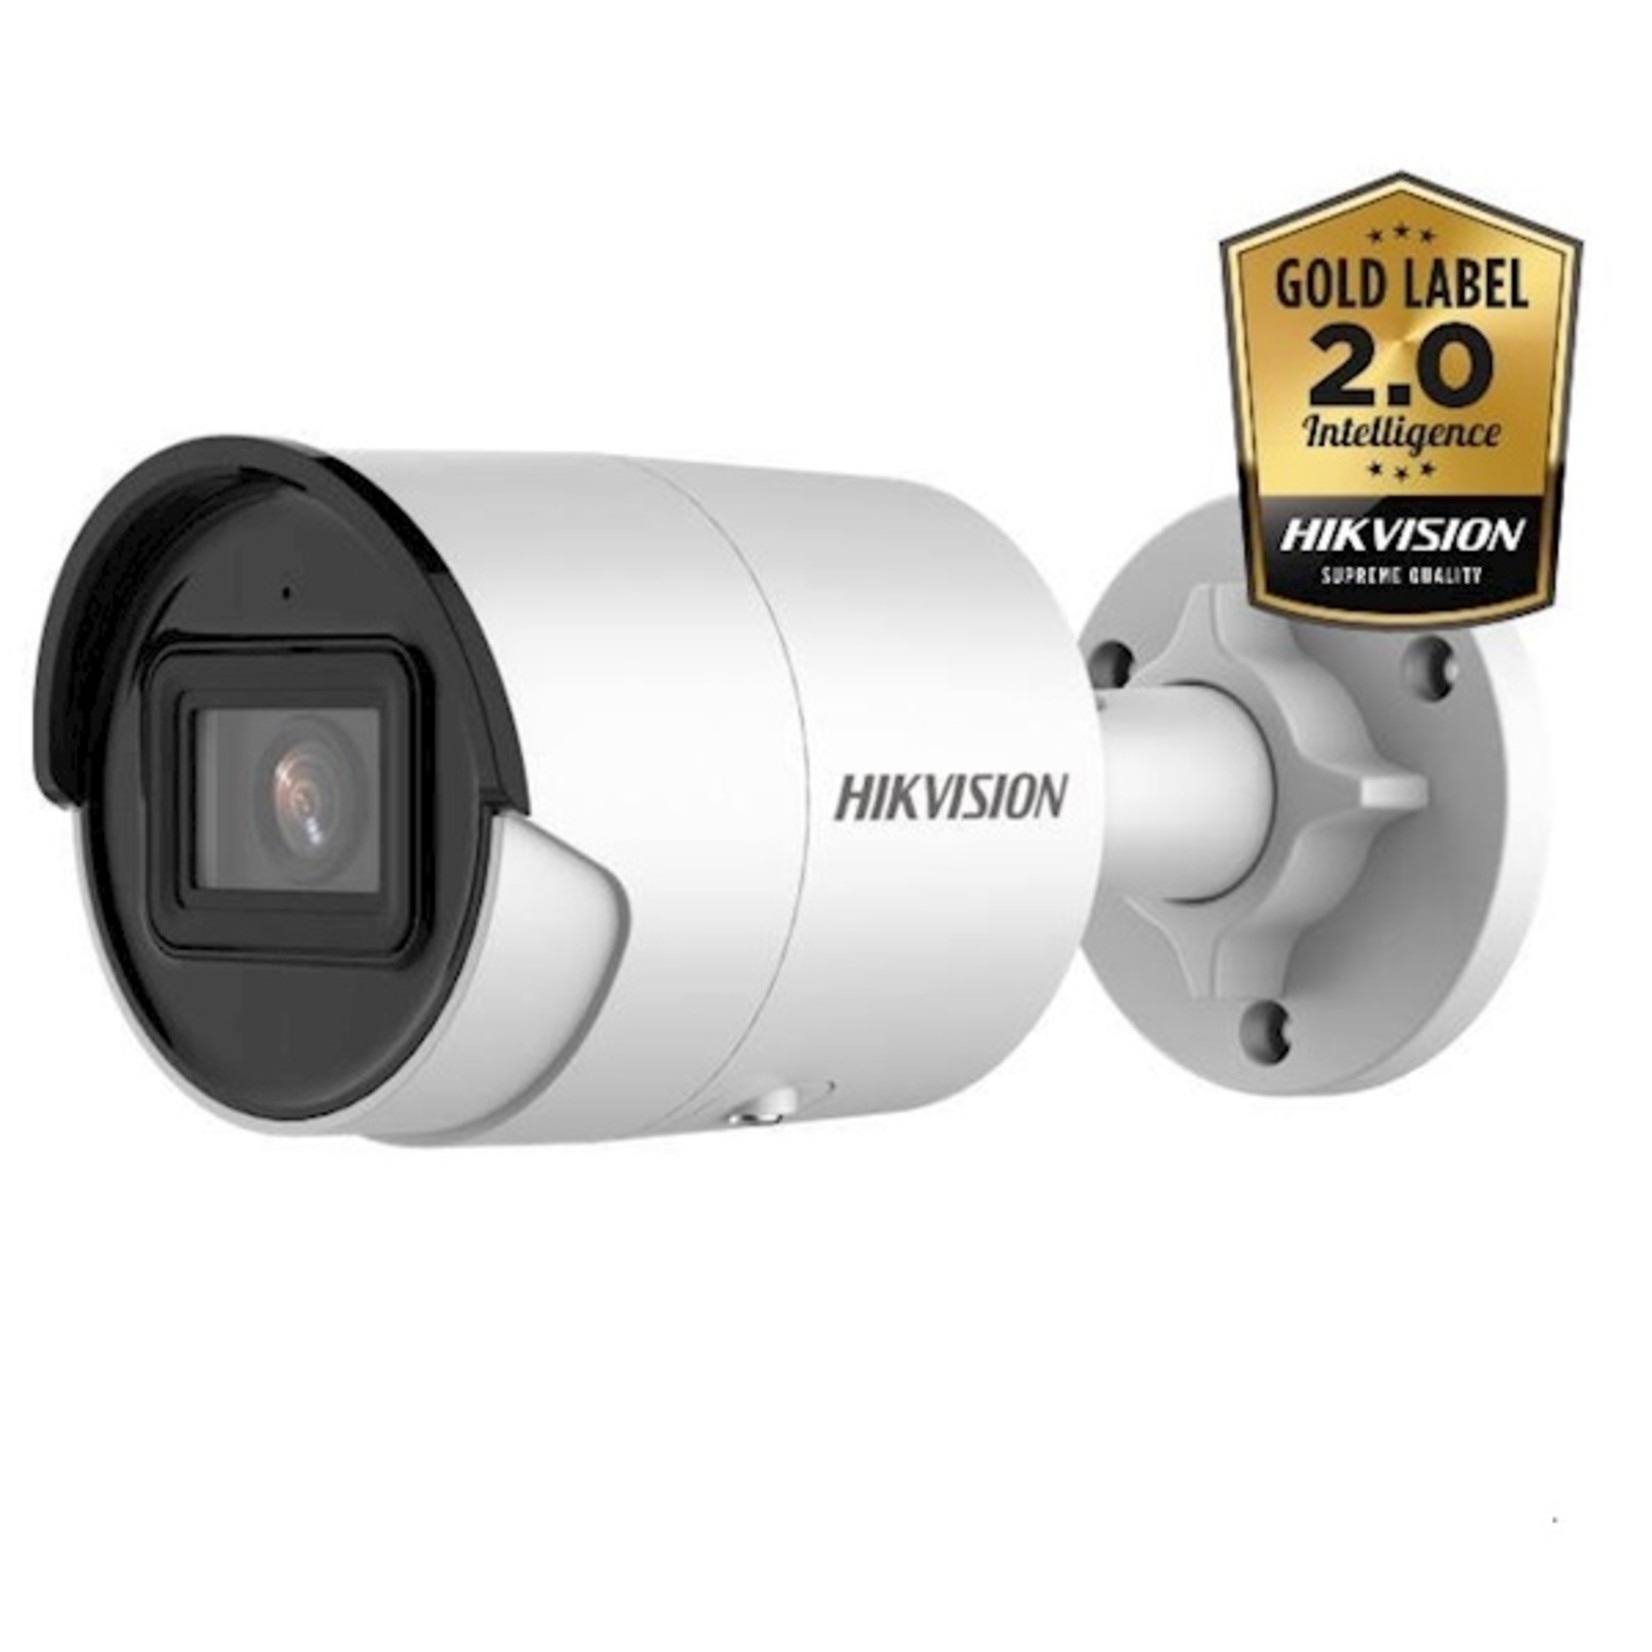 Hikvision DS-2CD2046G2-I, 4MP,  40m IR, WDR